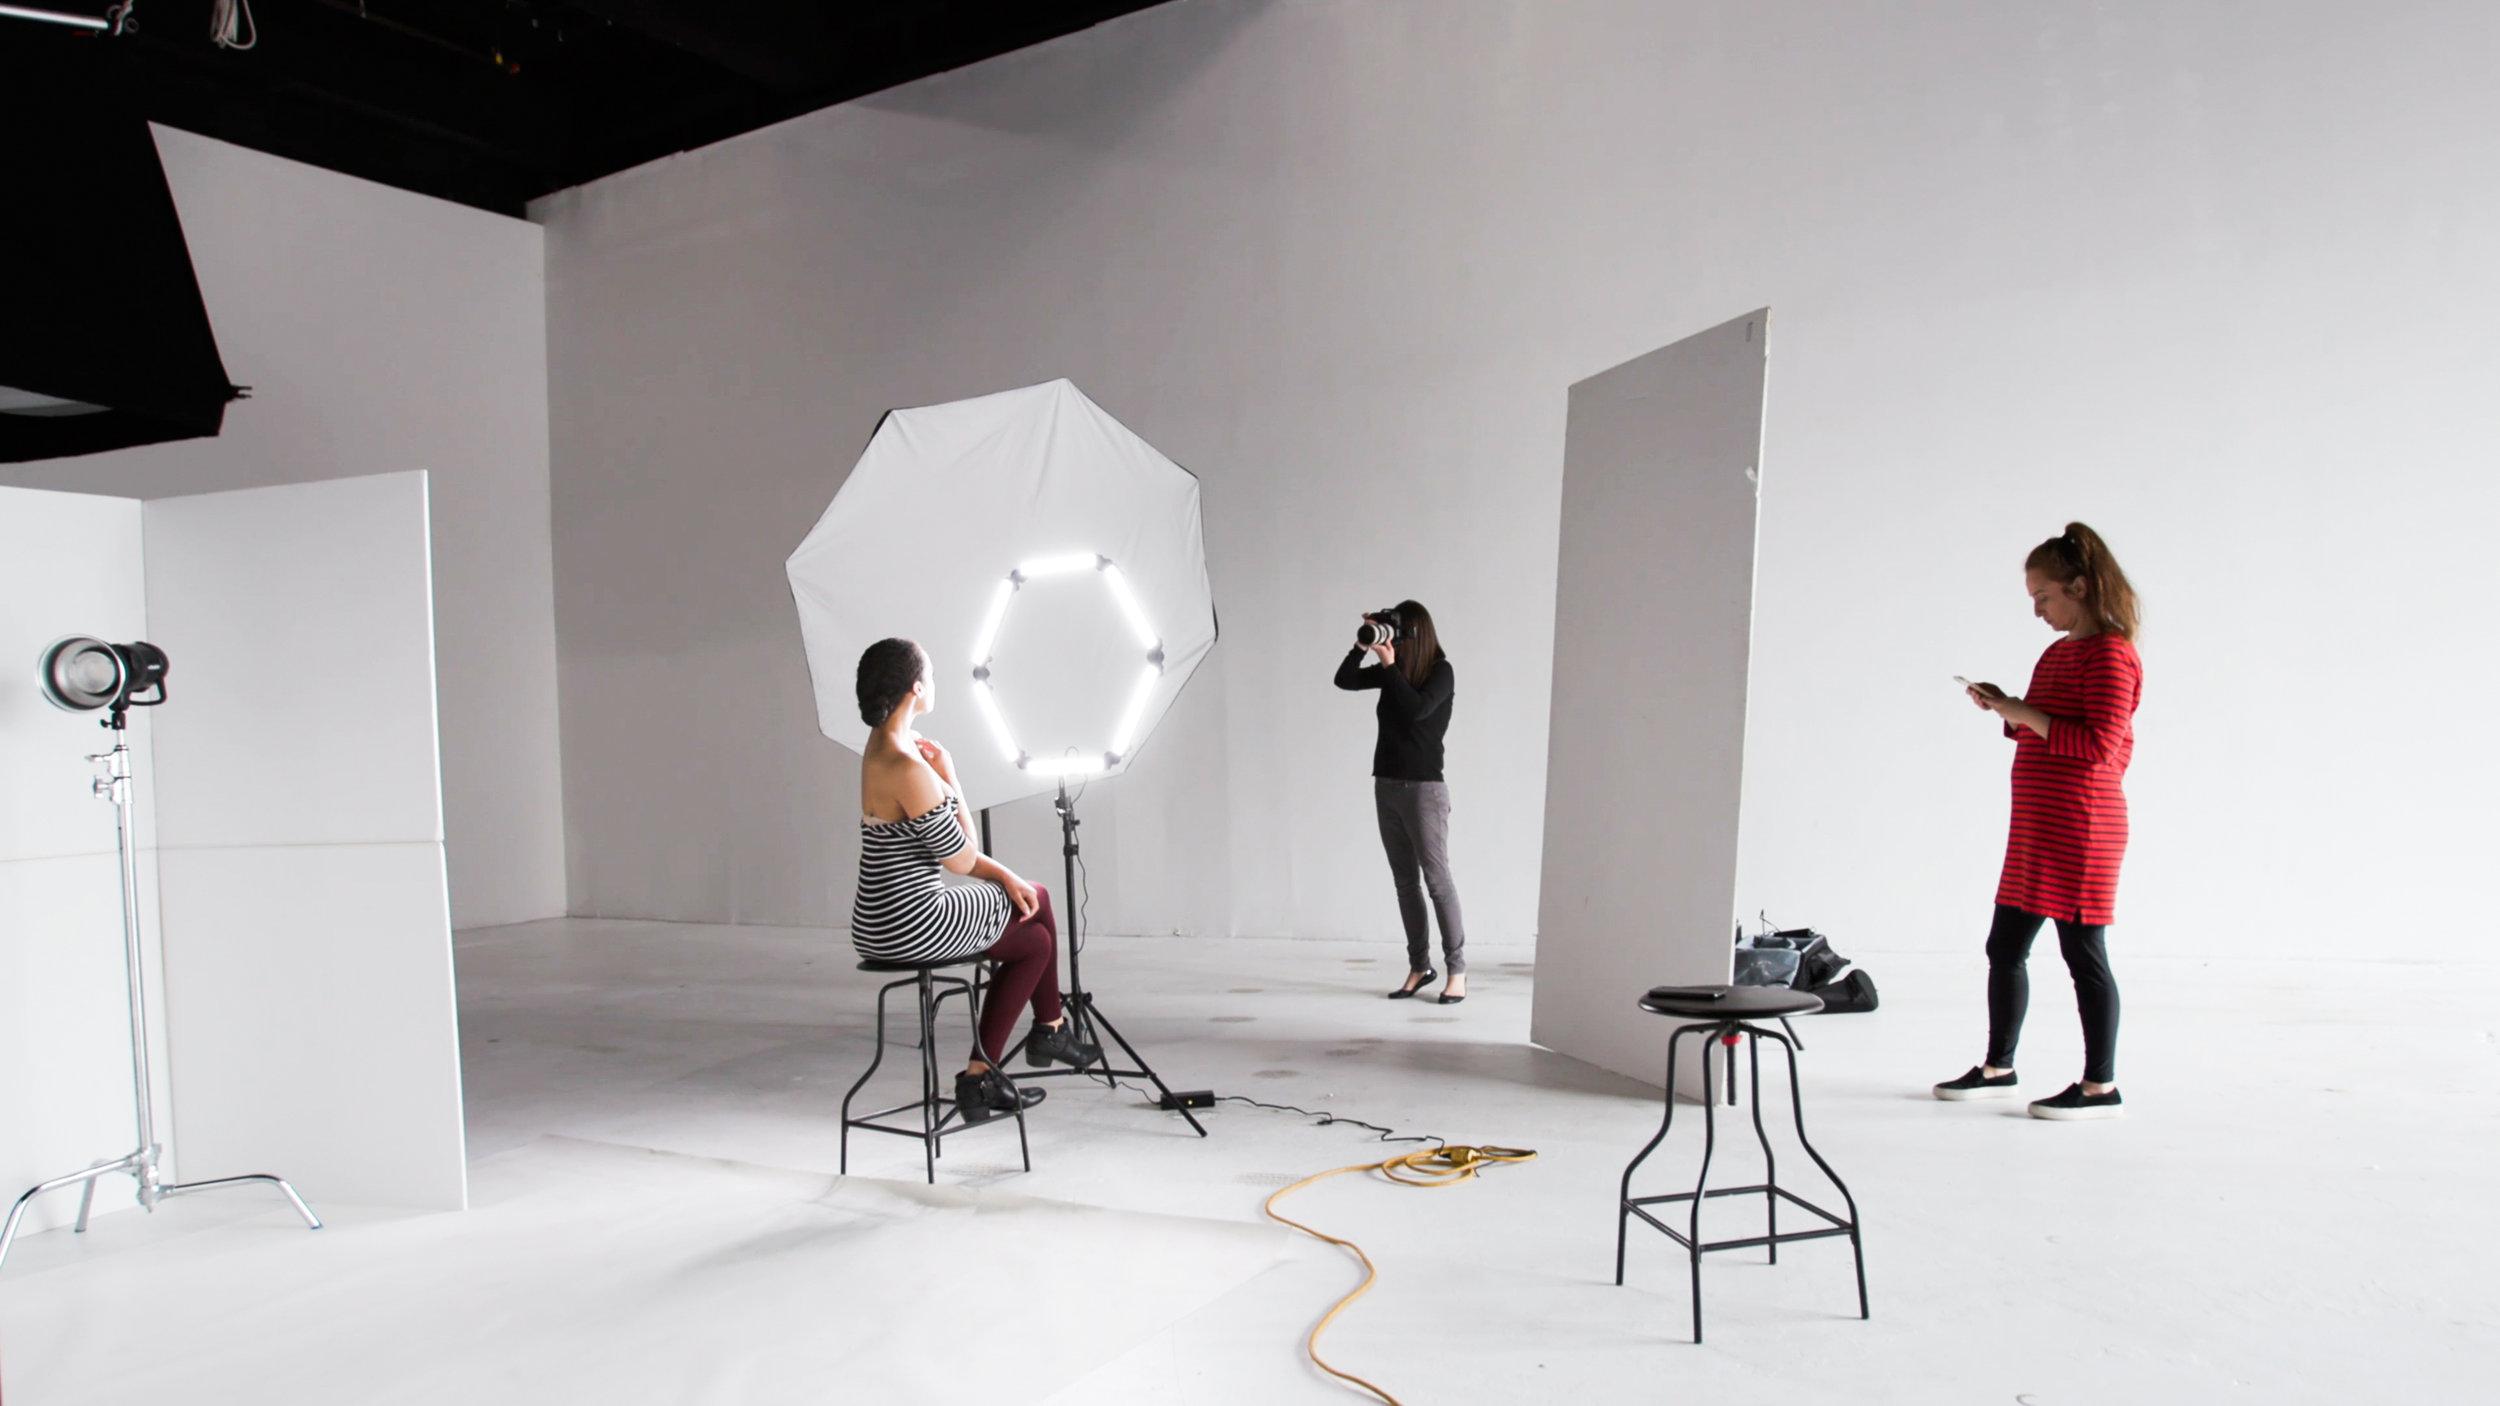 Behind-the-scenes: Boston Magazine photo shoot for Best of Boston 2019. Photographer: Diana Levine